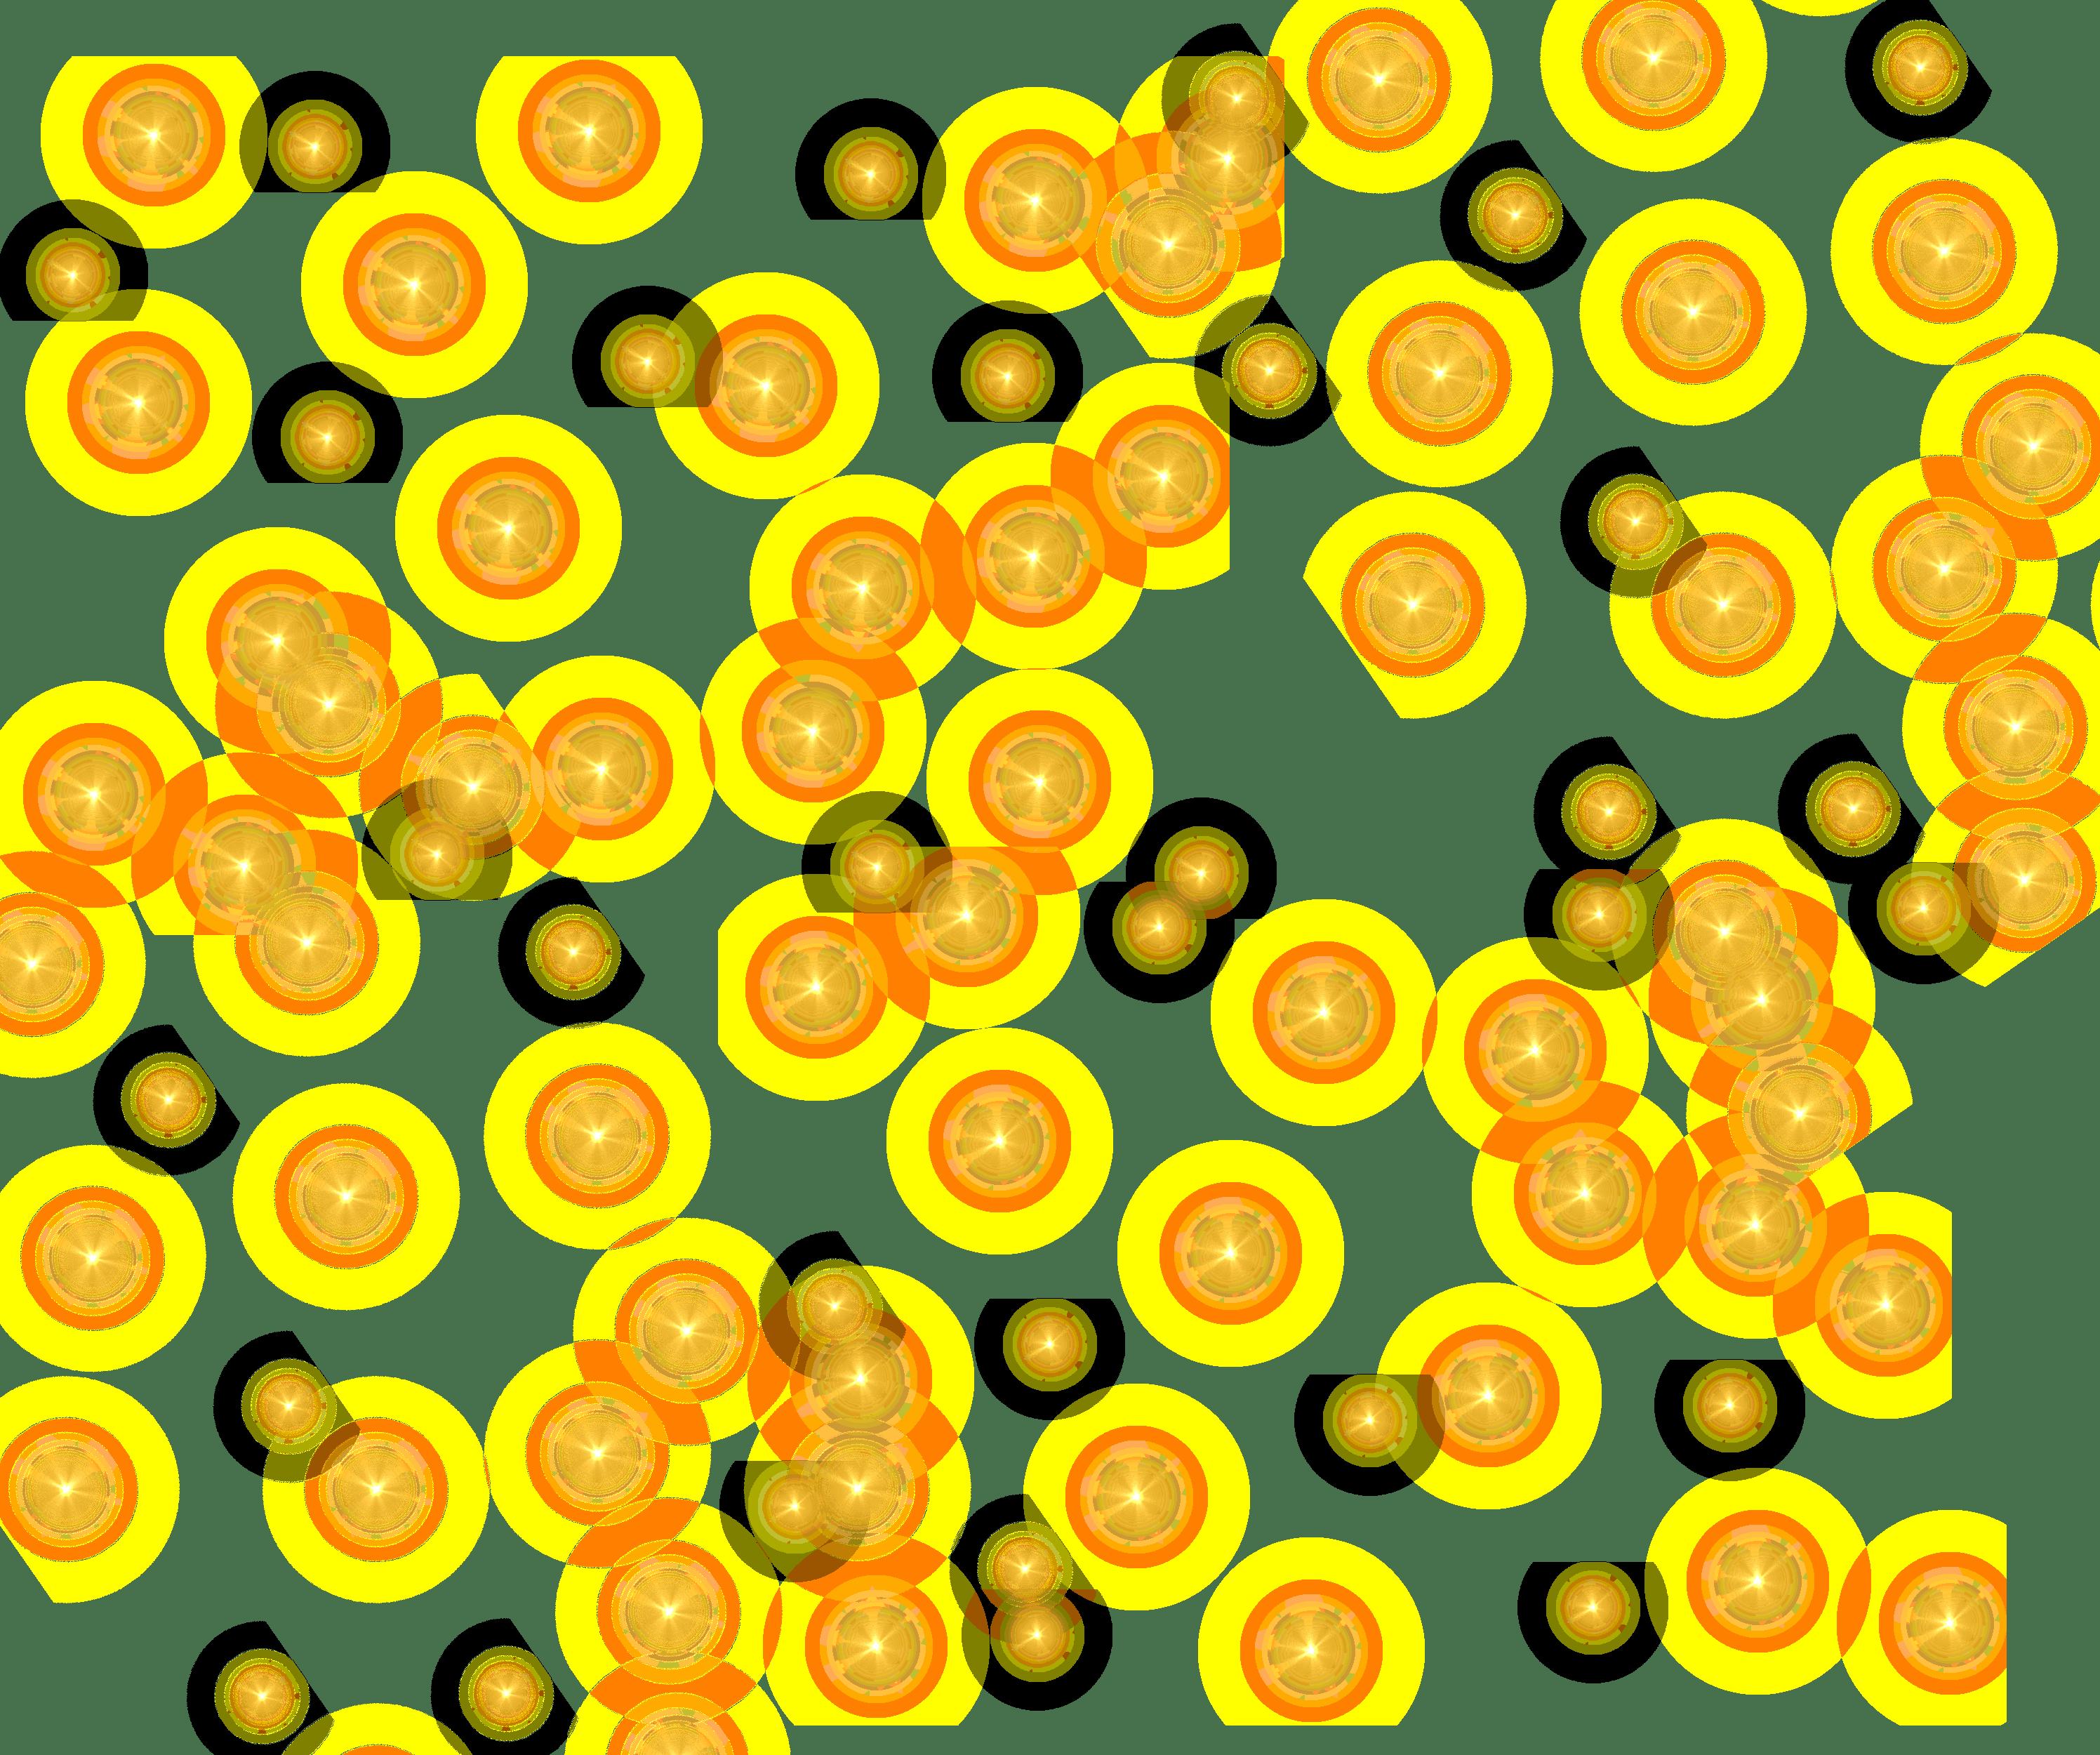 Star confetti clipart image freeuse stock Star transparent PNG images - StickPNG image freeuse stock